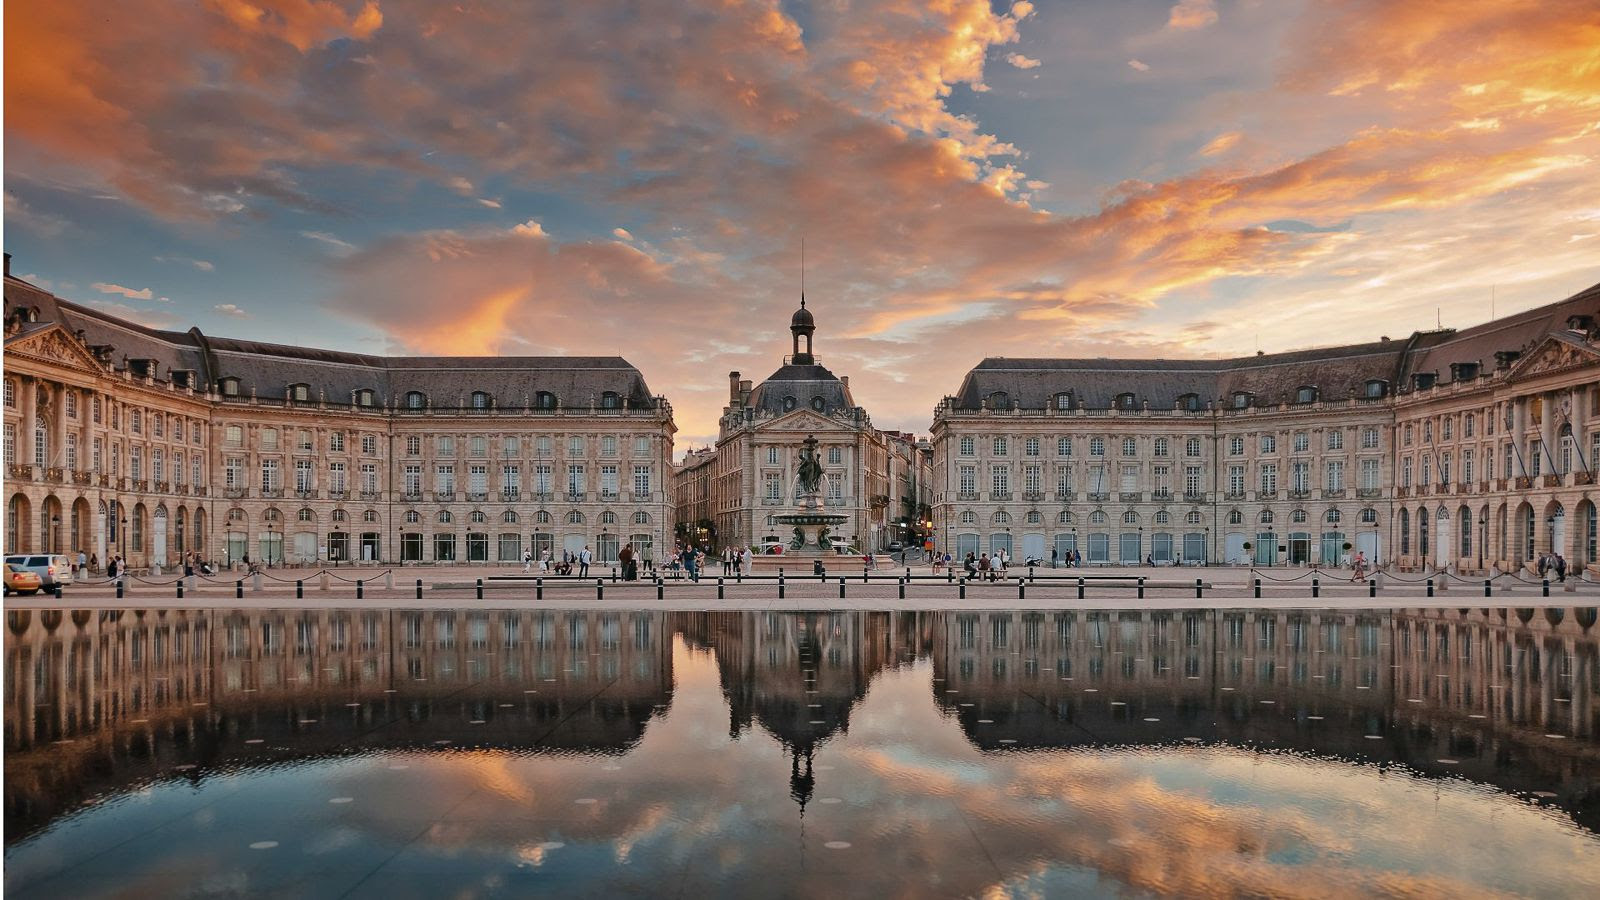 7 Must-See Buildings in France